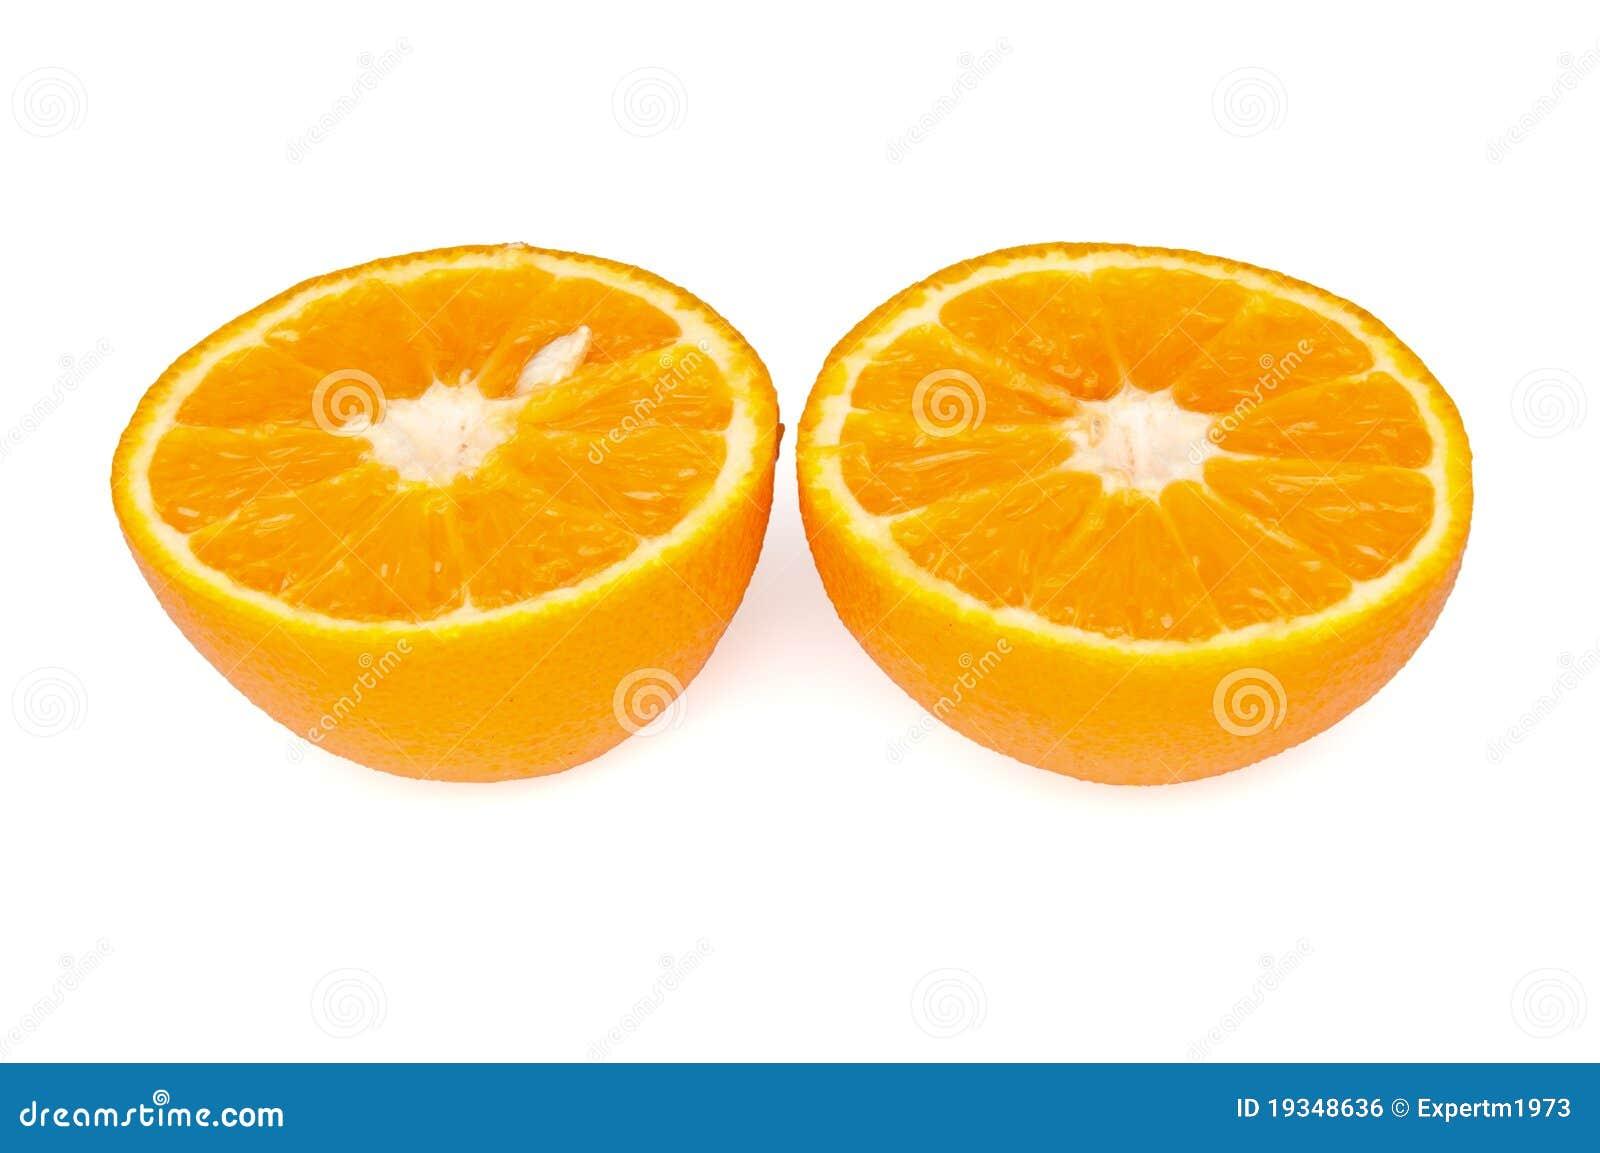 Https Www Dreamstime Com Royalty Free Stock Image Cut Half Orange Image19348636